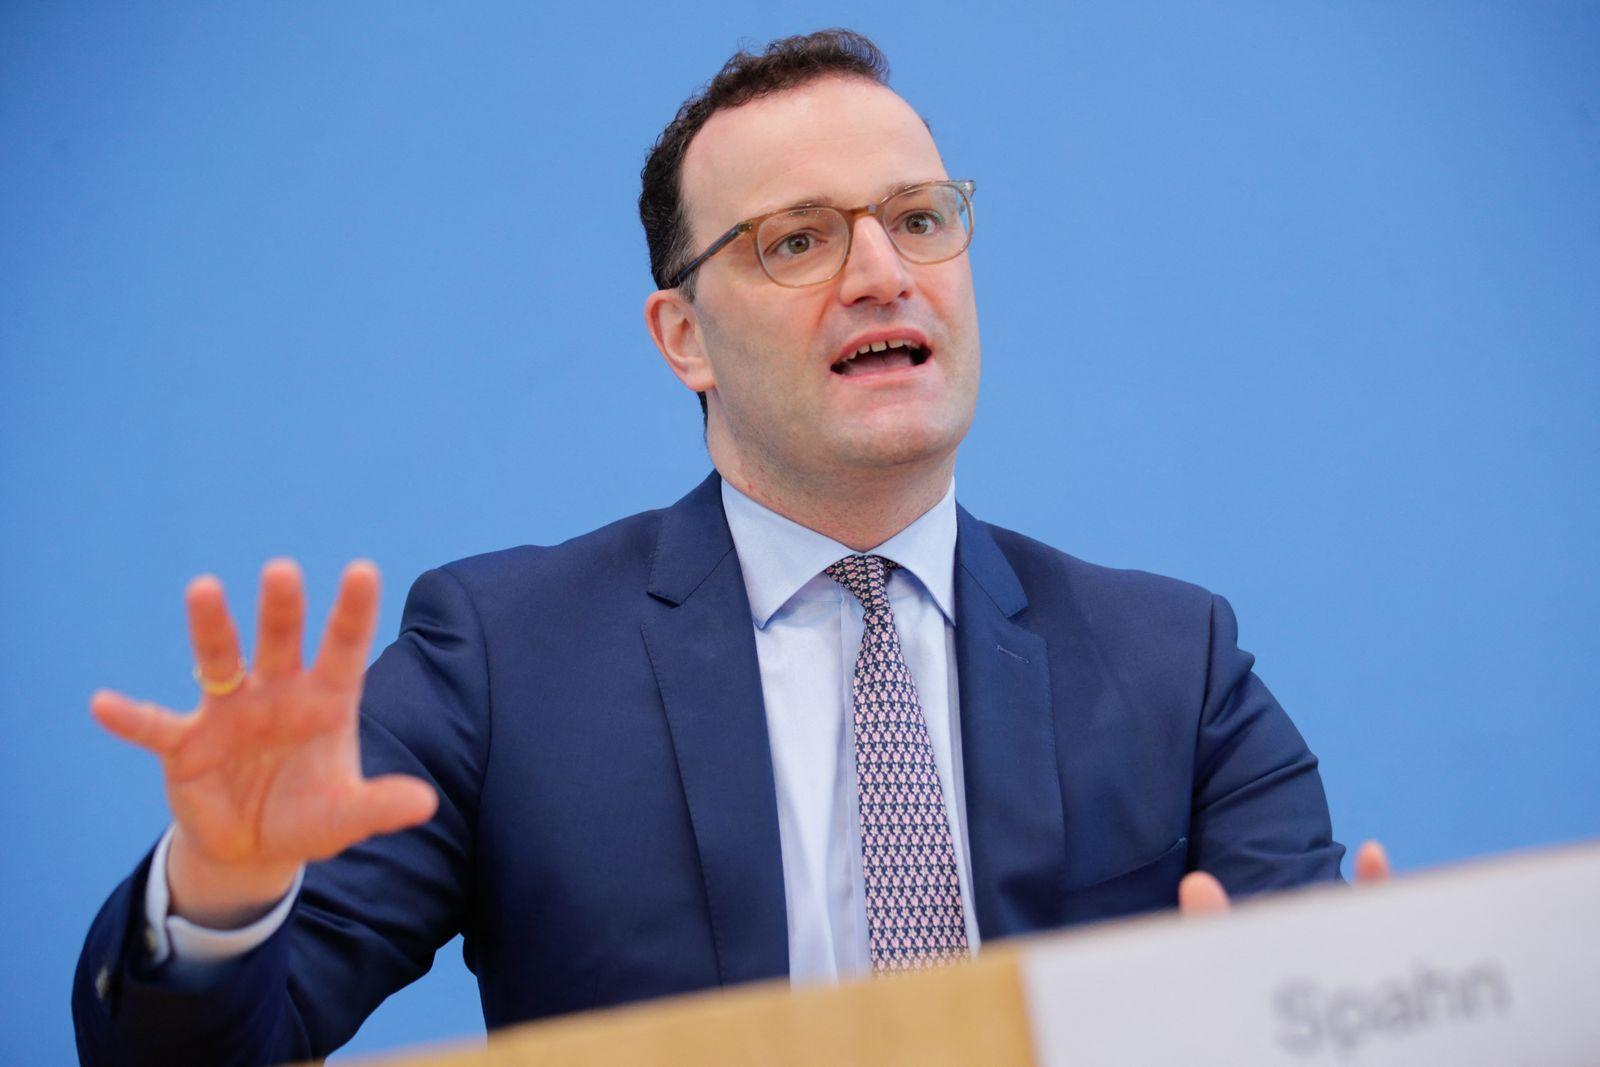 Health Minister Jens Spahn, RKI health authority head Lothar Wieler hold press conference